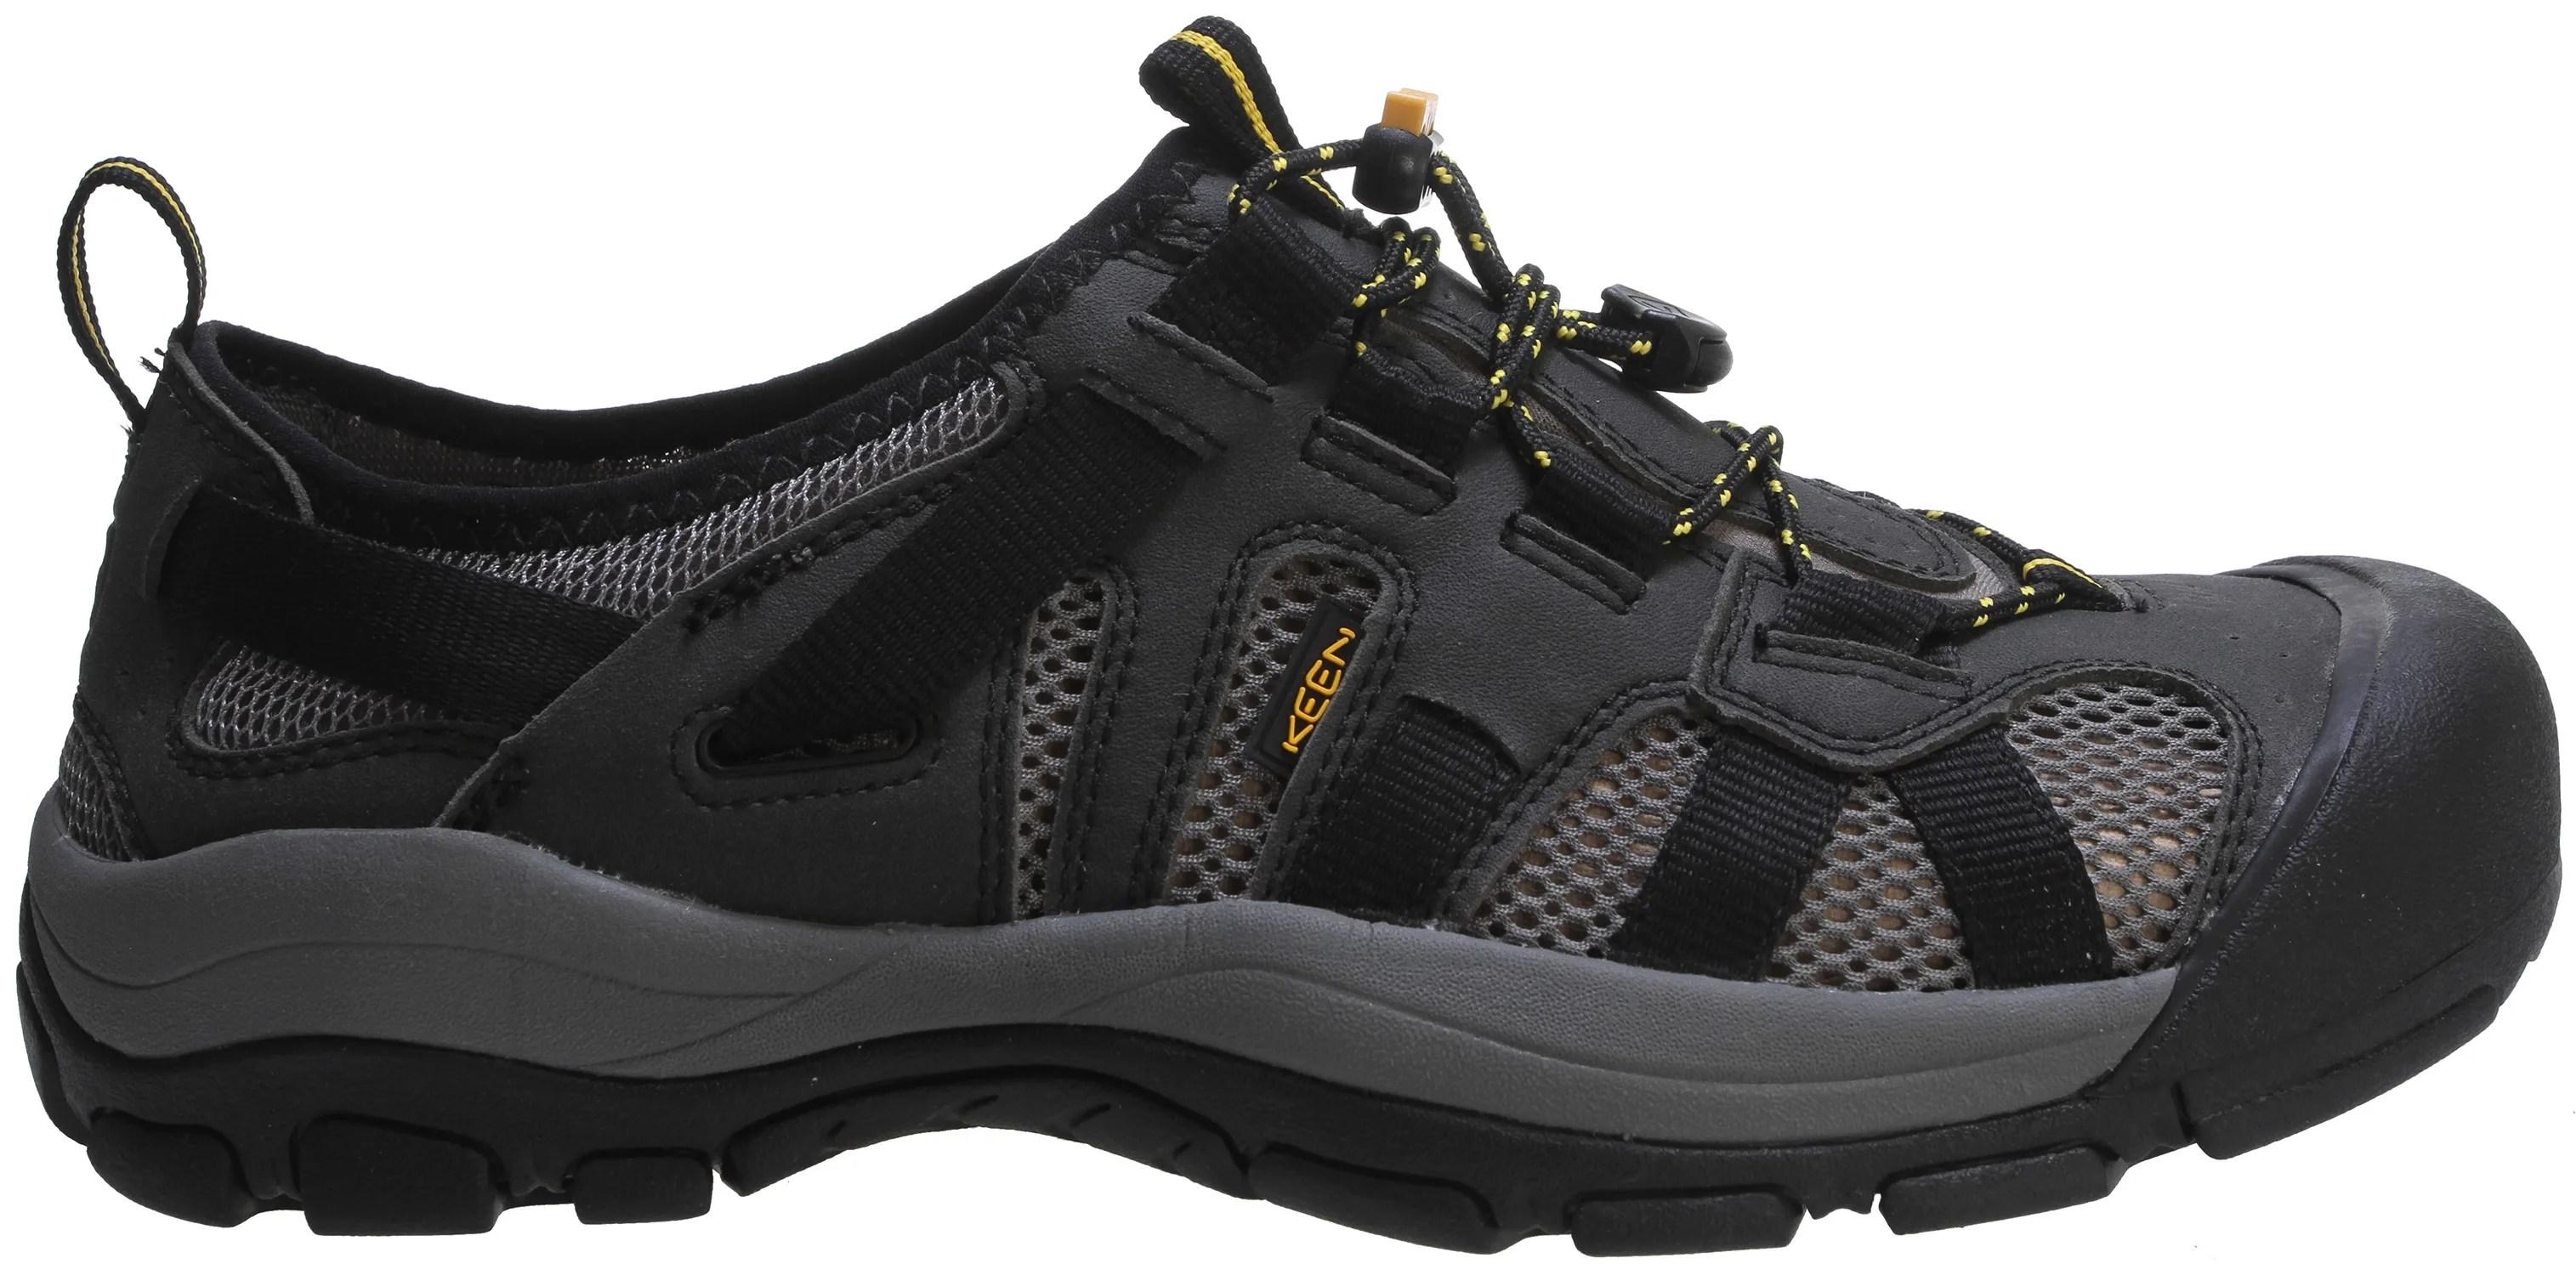 Keen Hiking Shoes Sale